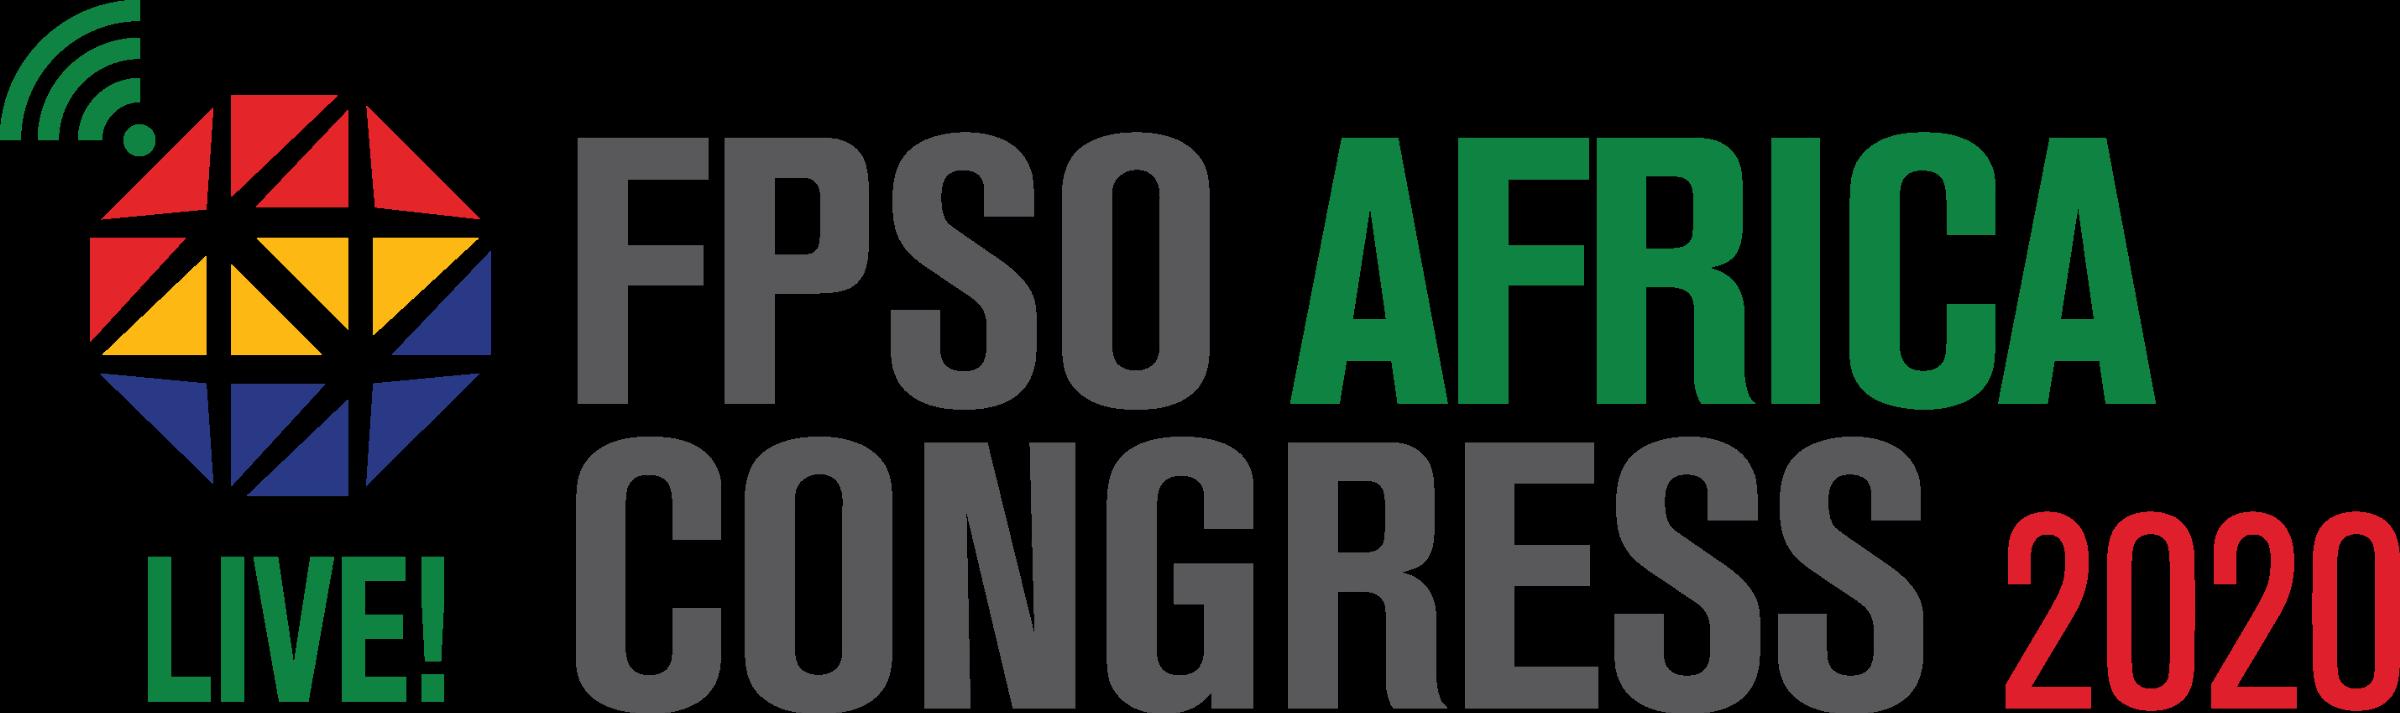 FPSO Africa Congress 2020